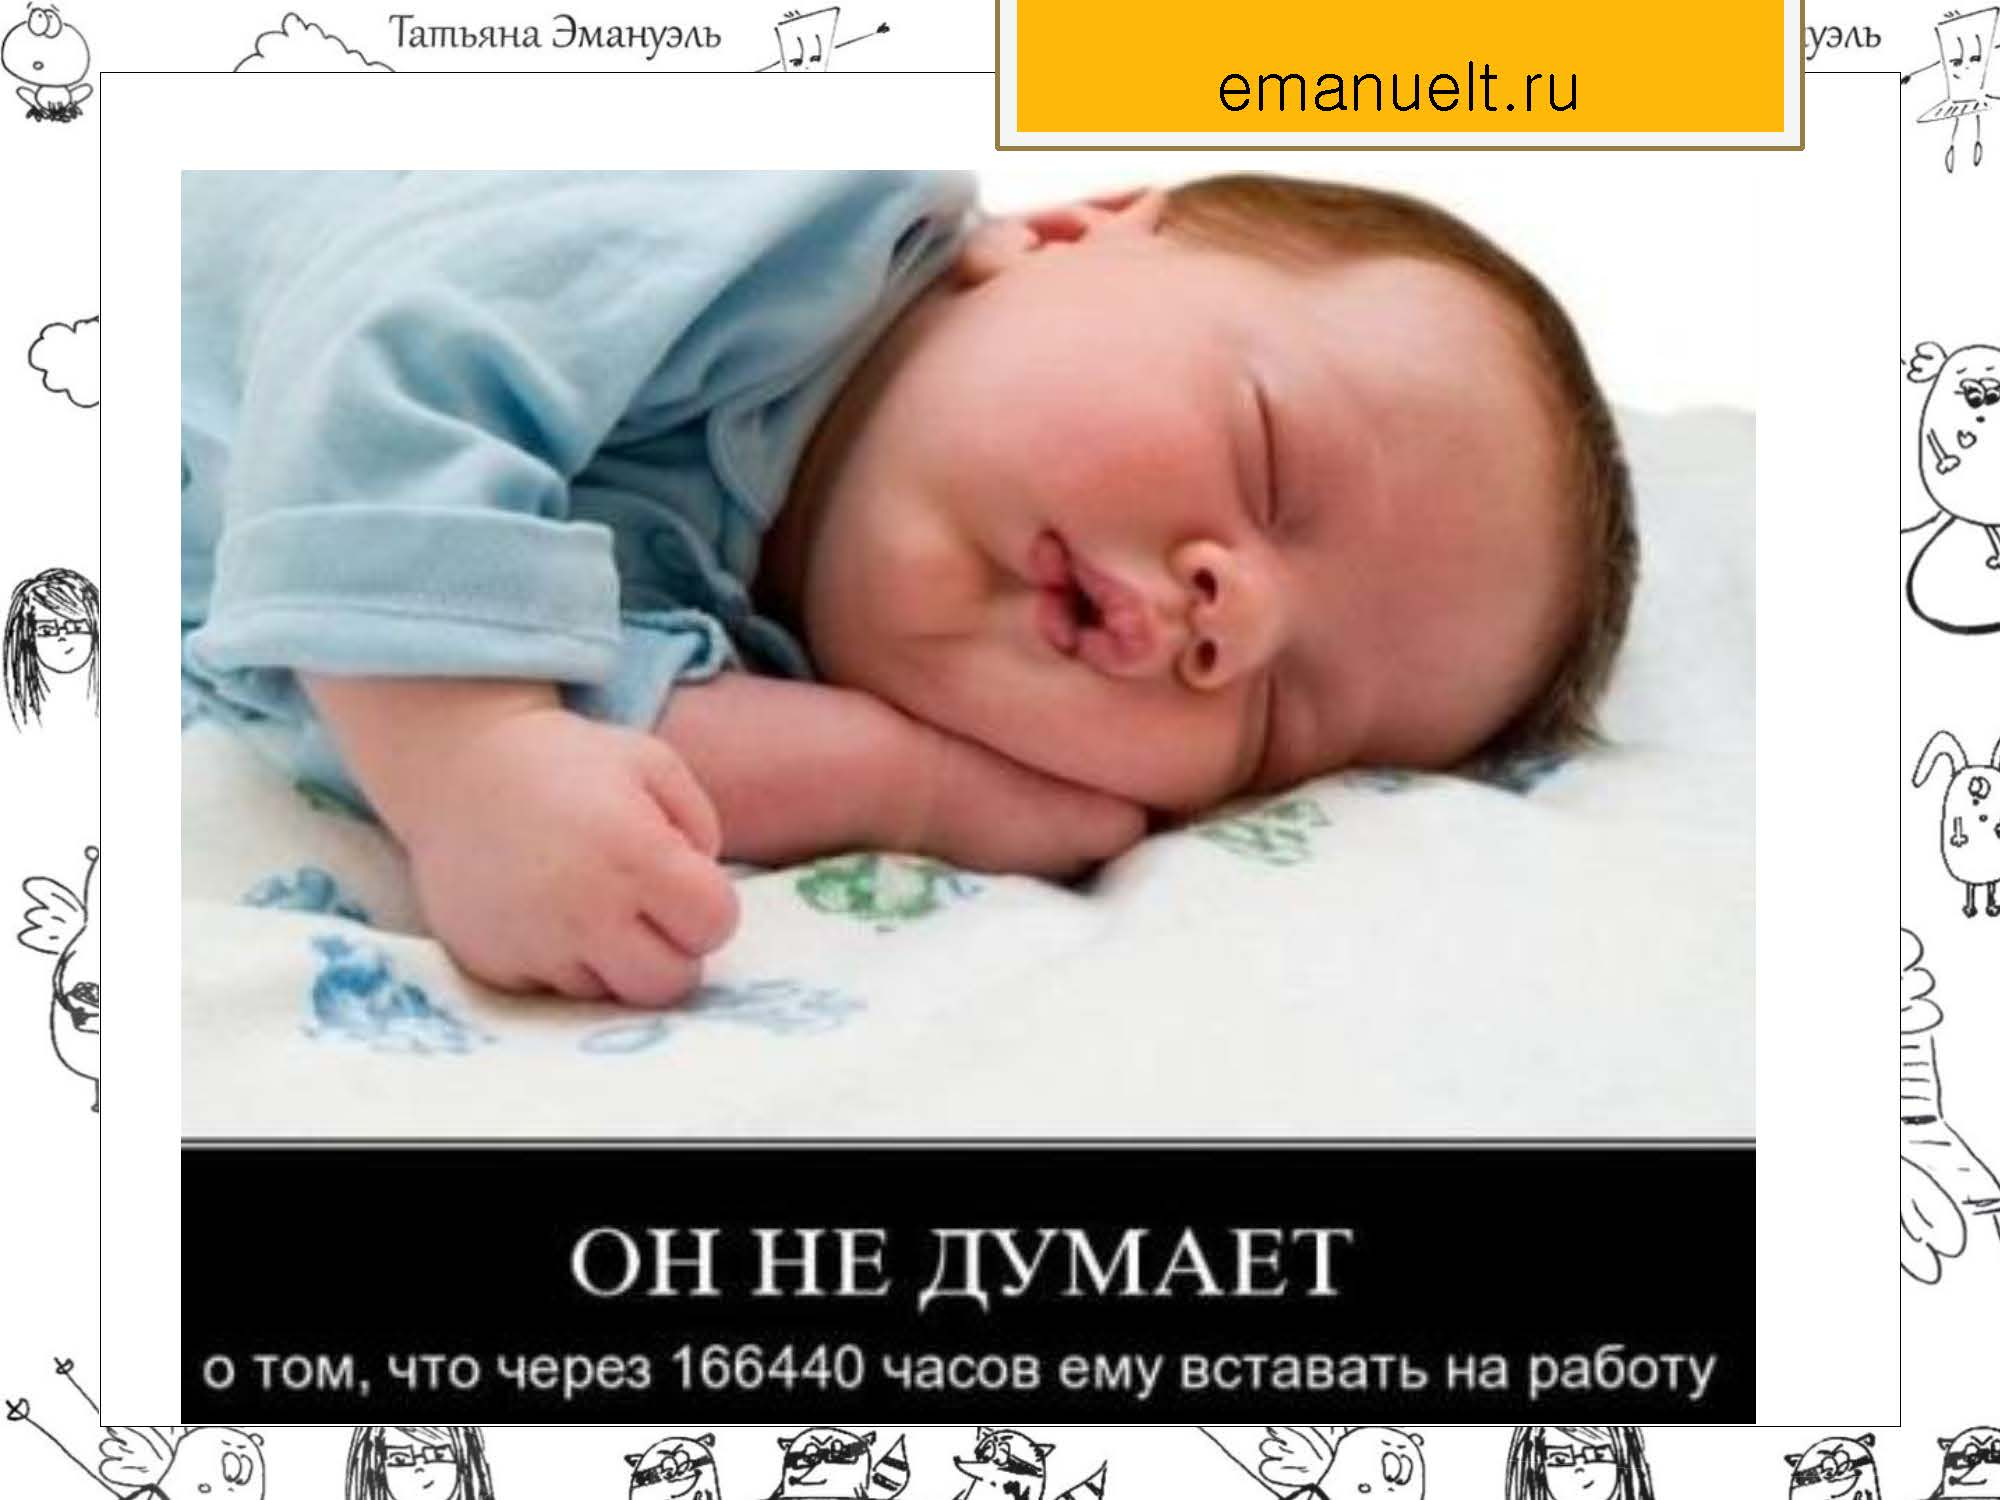 22.01.15 COH emanuel_Страница_35